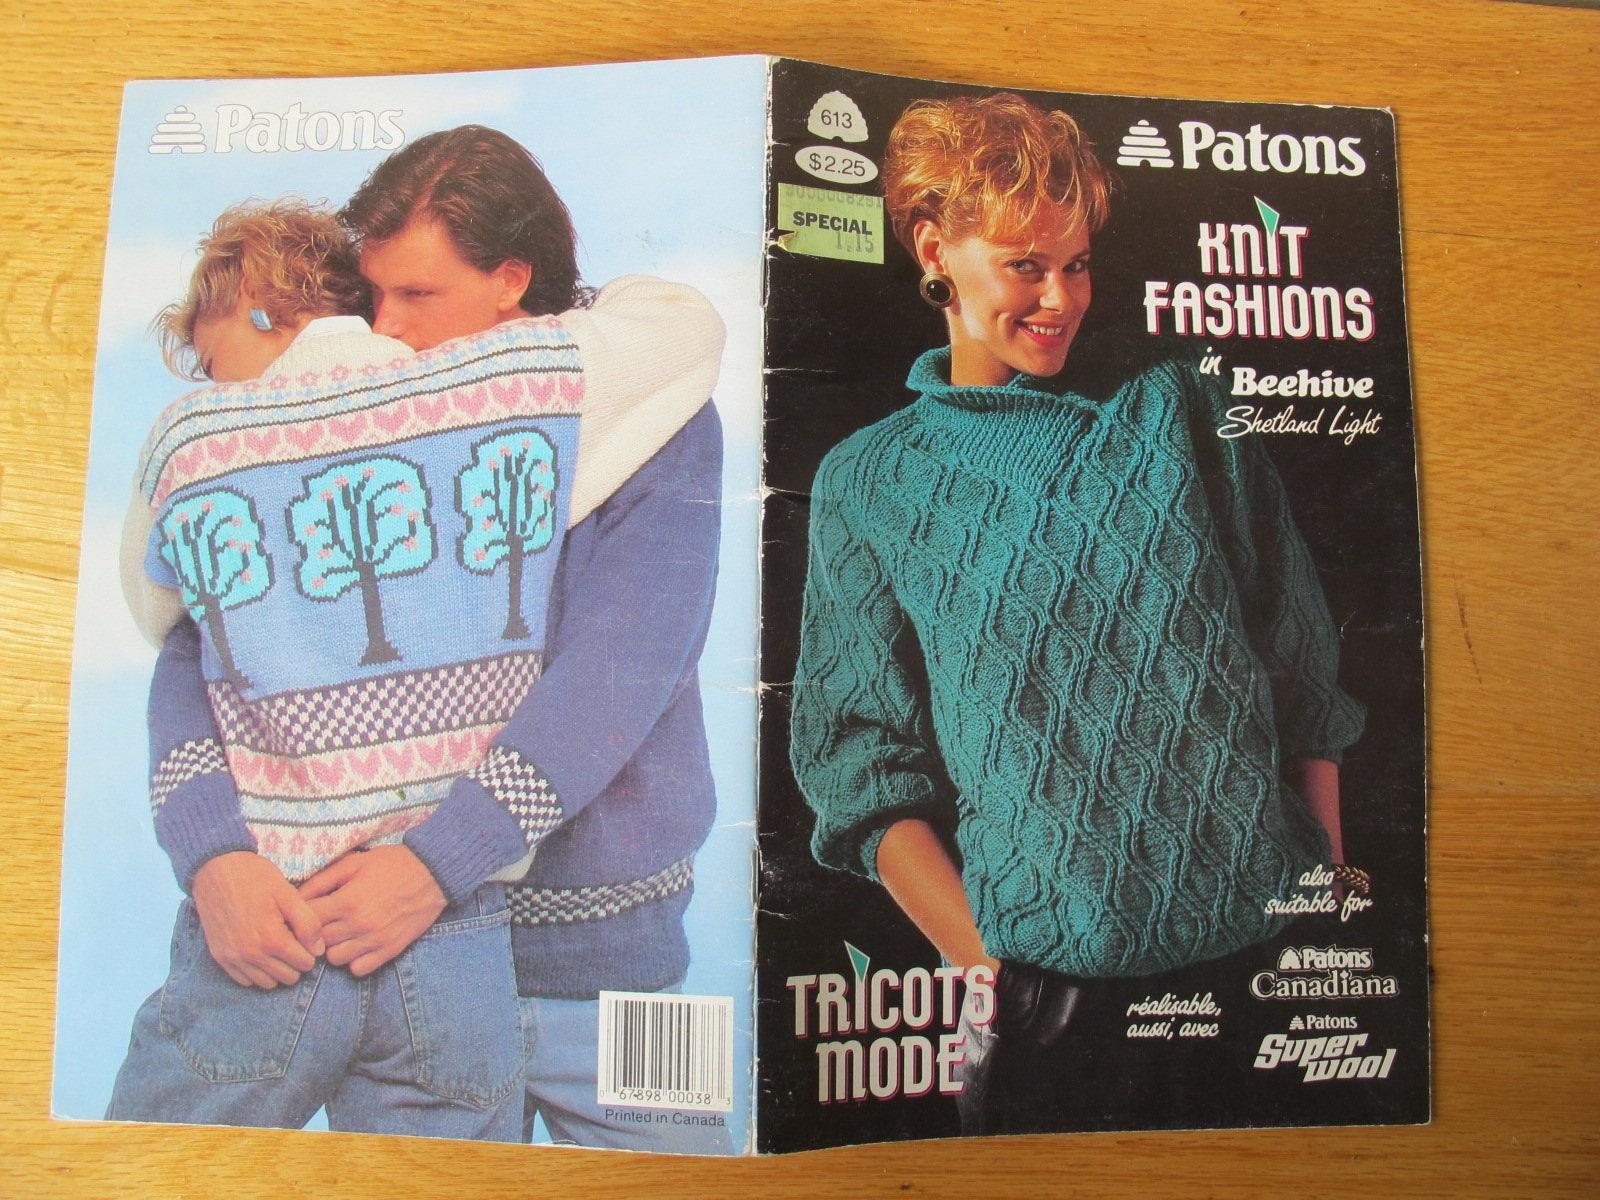 Patons Knit Fashions in Beehive Shetland Light / Fisherman knit ...